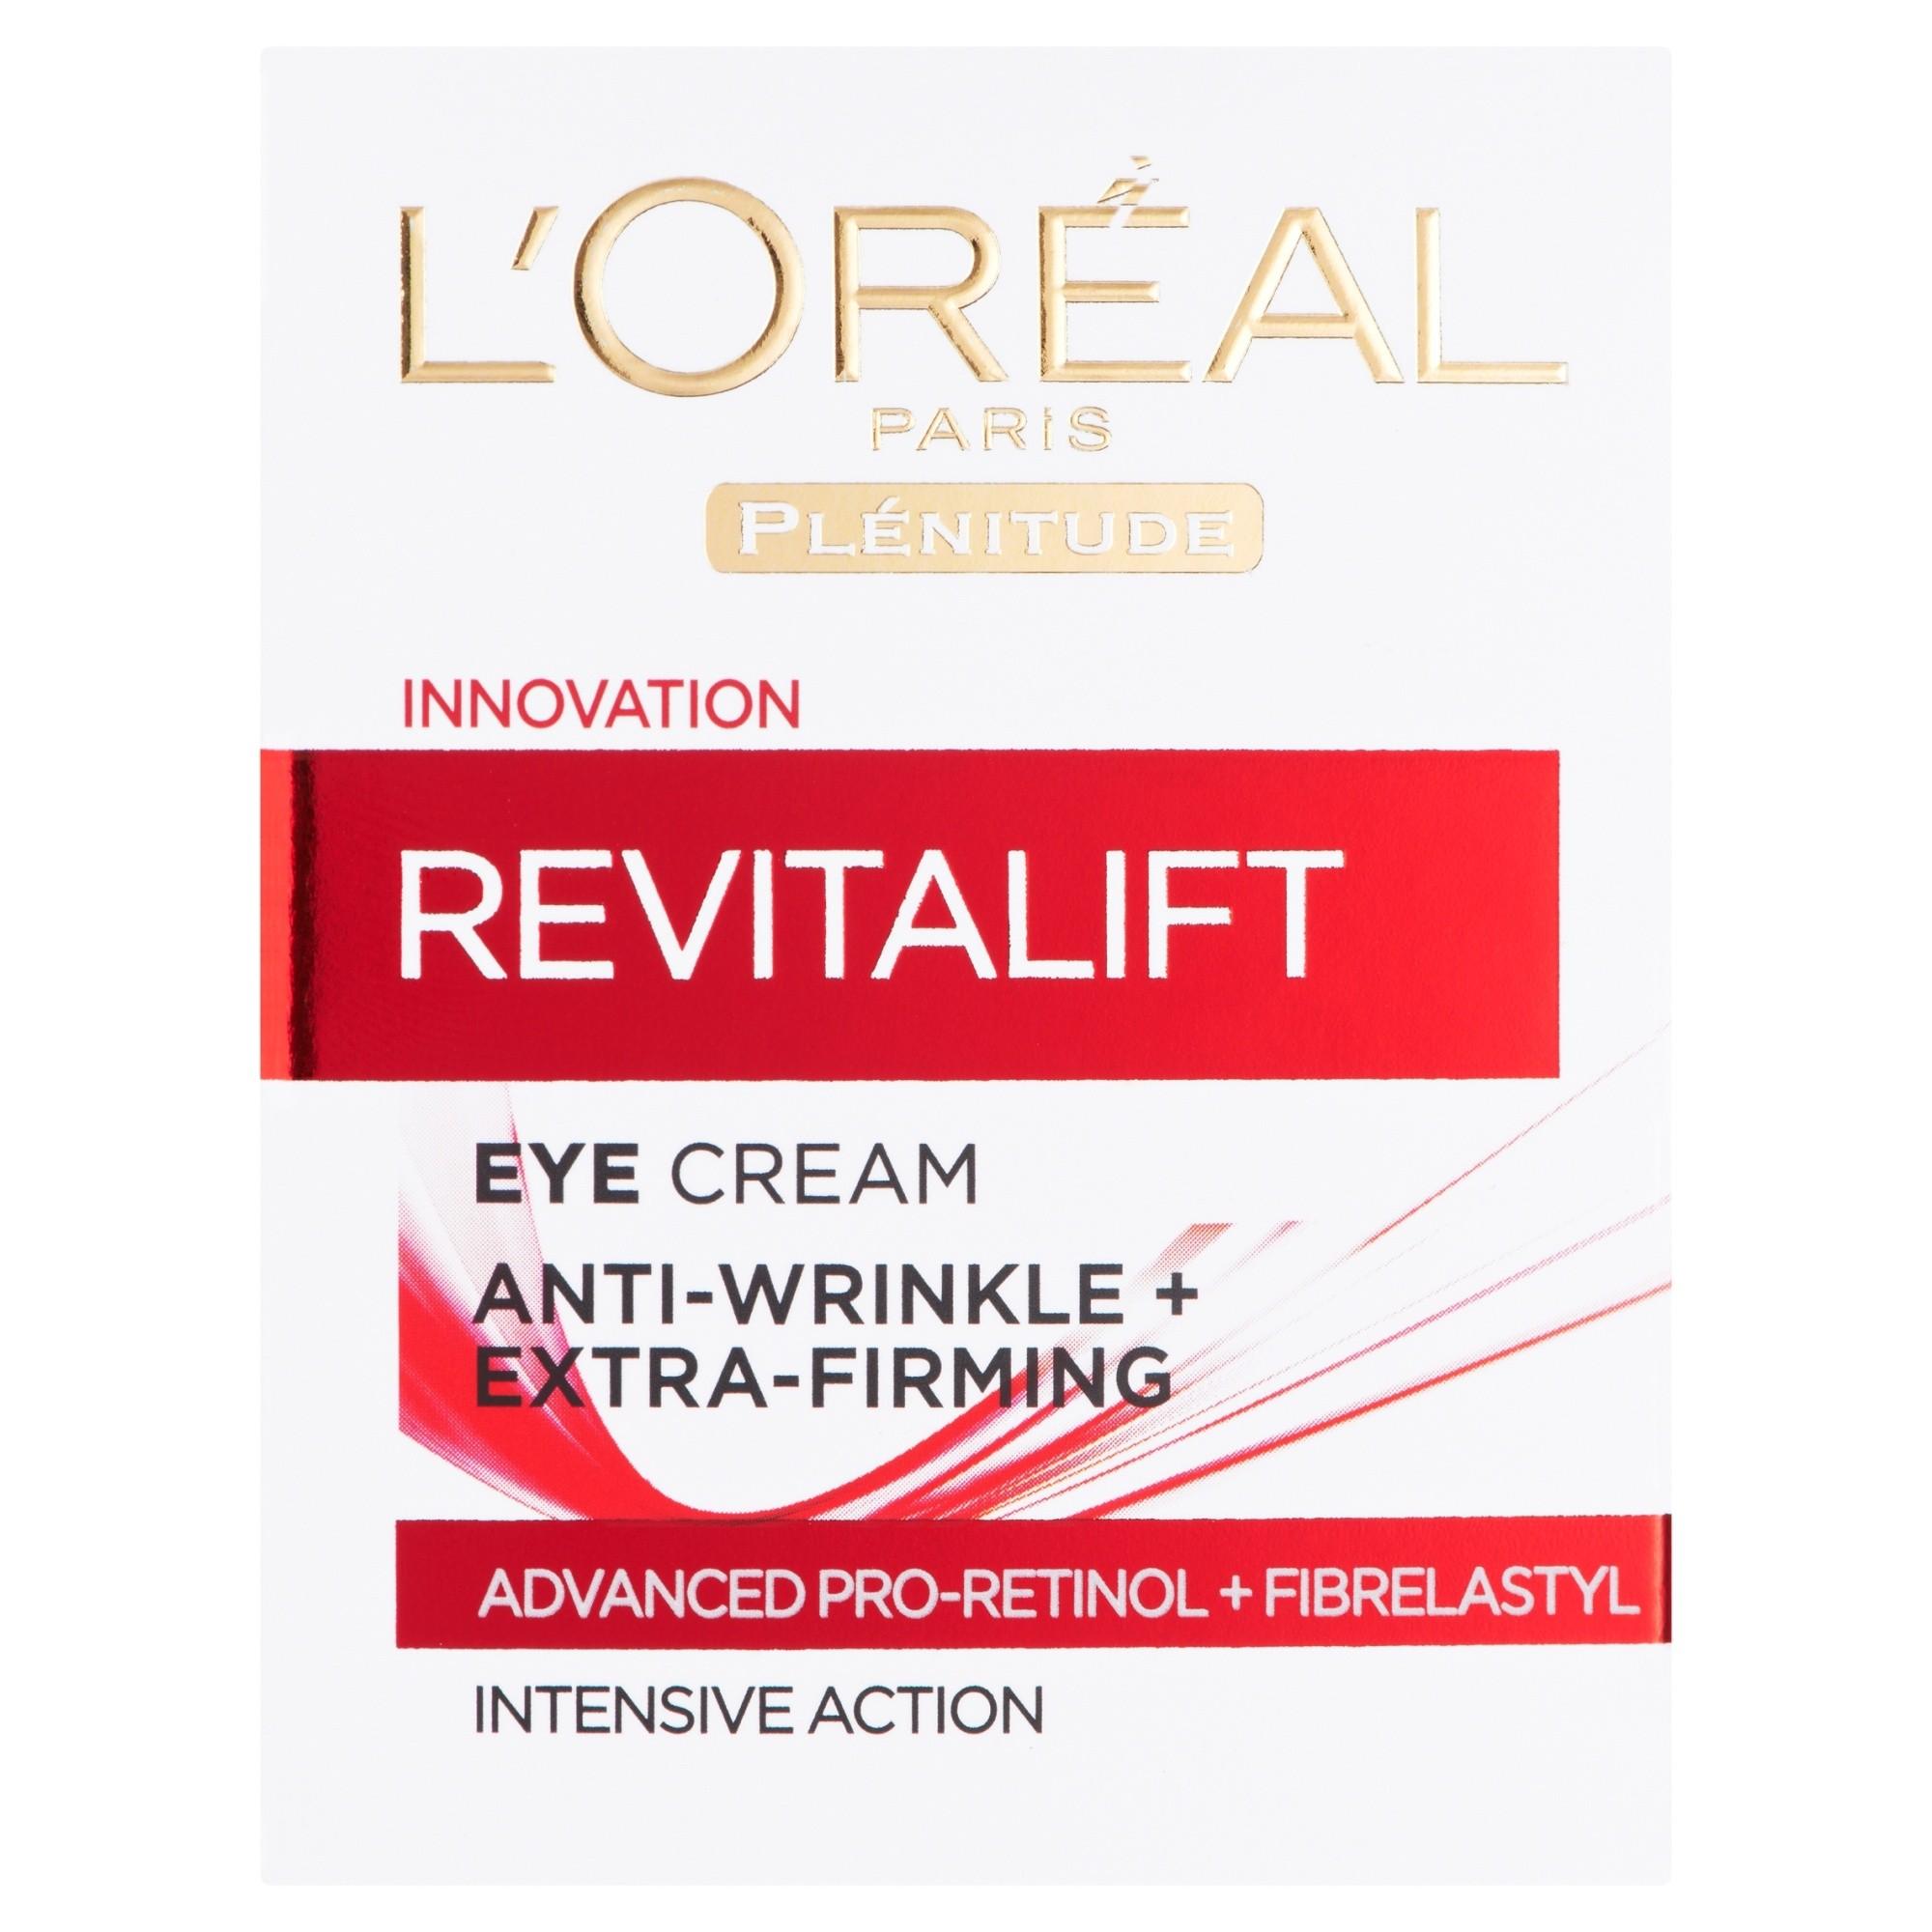 L'Oreal Paris Revitalift Anti-Wrinkle Eye Cream